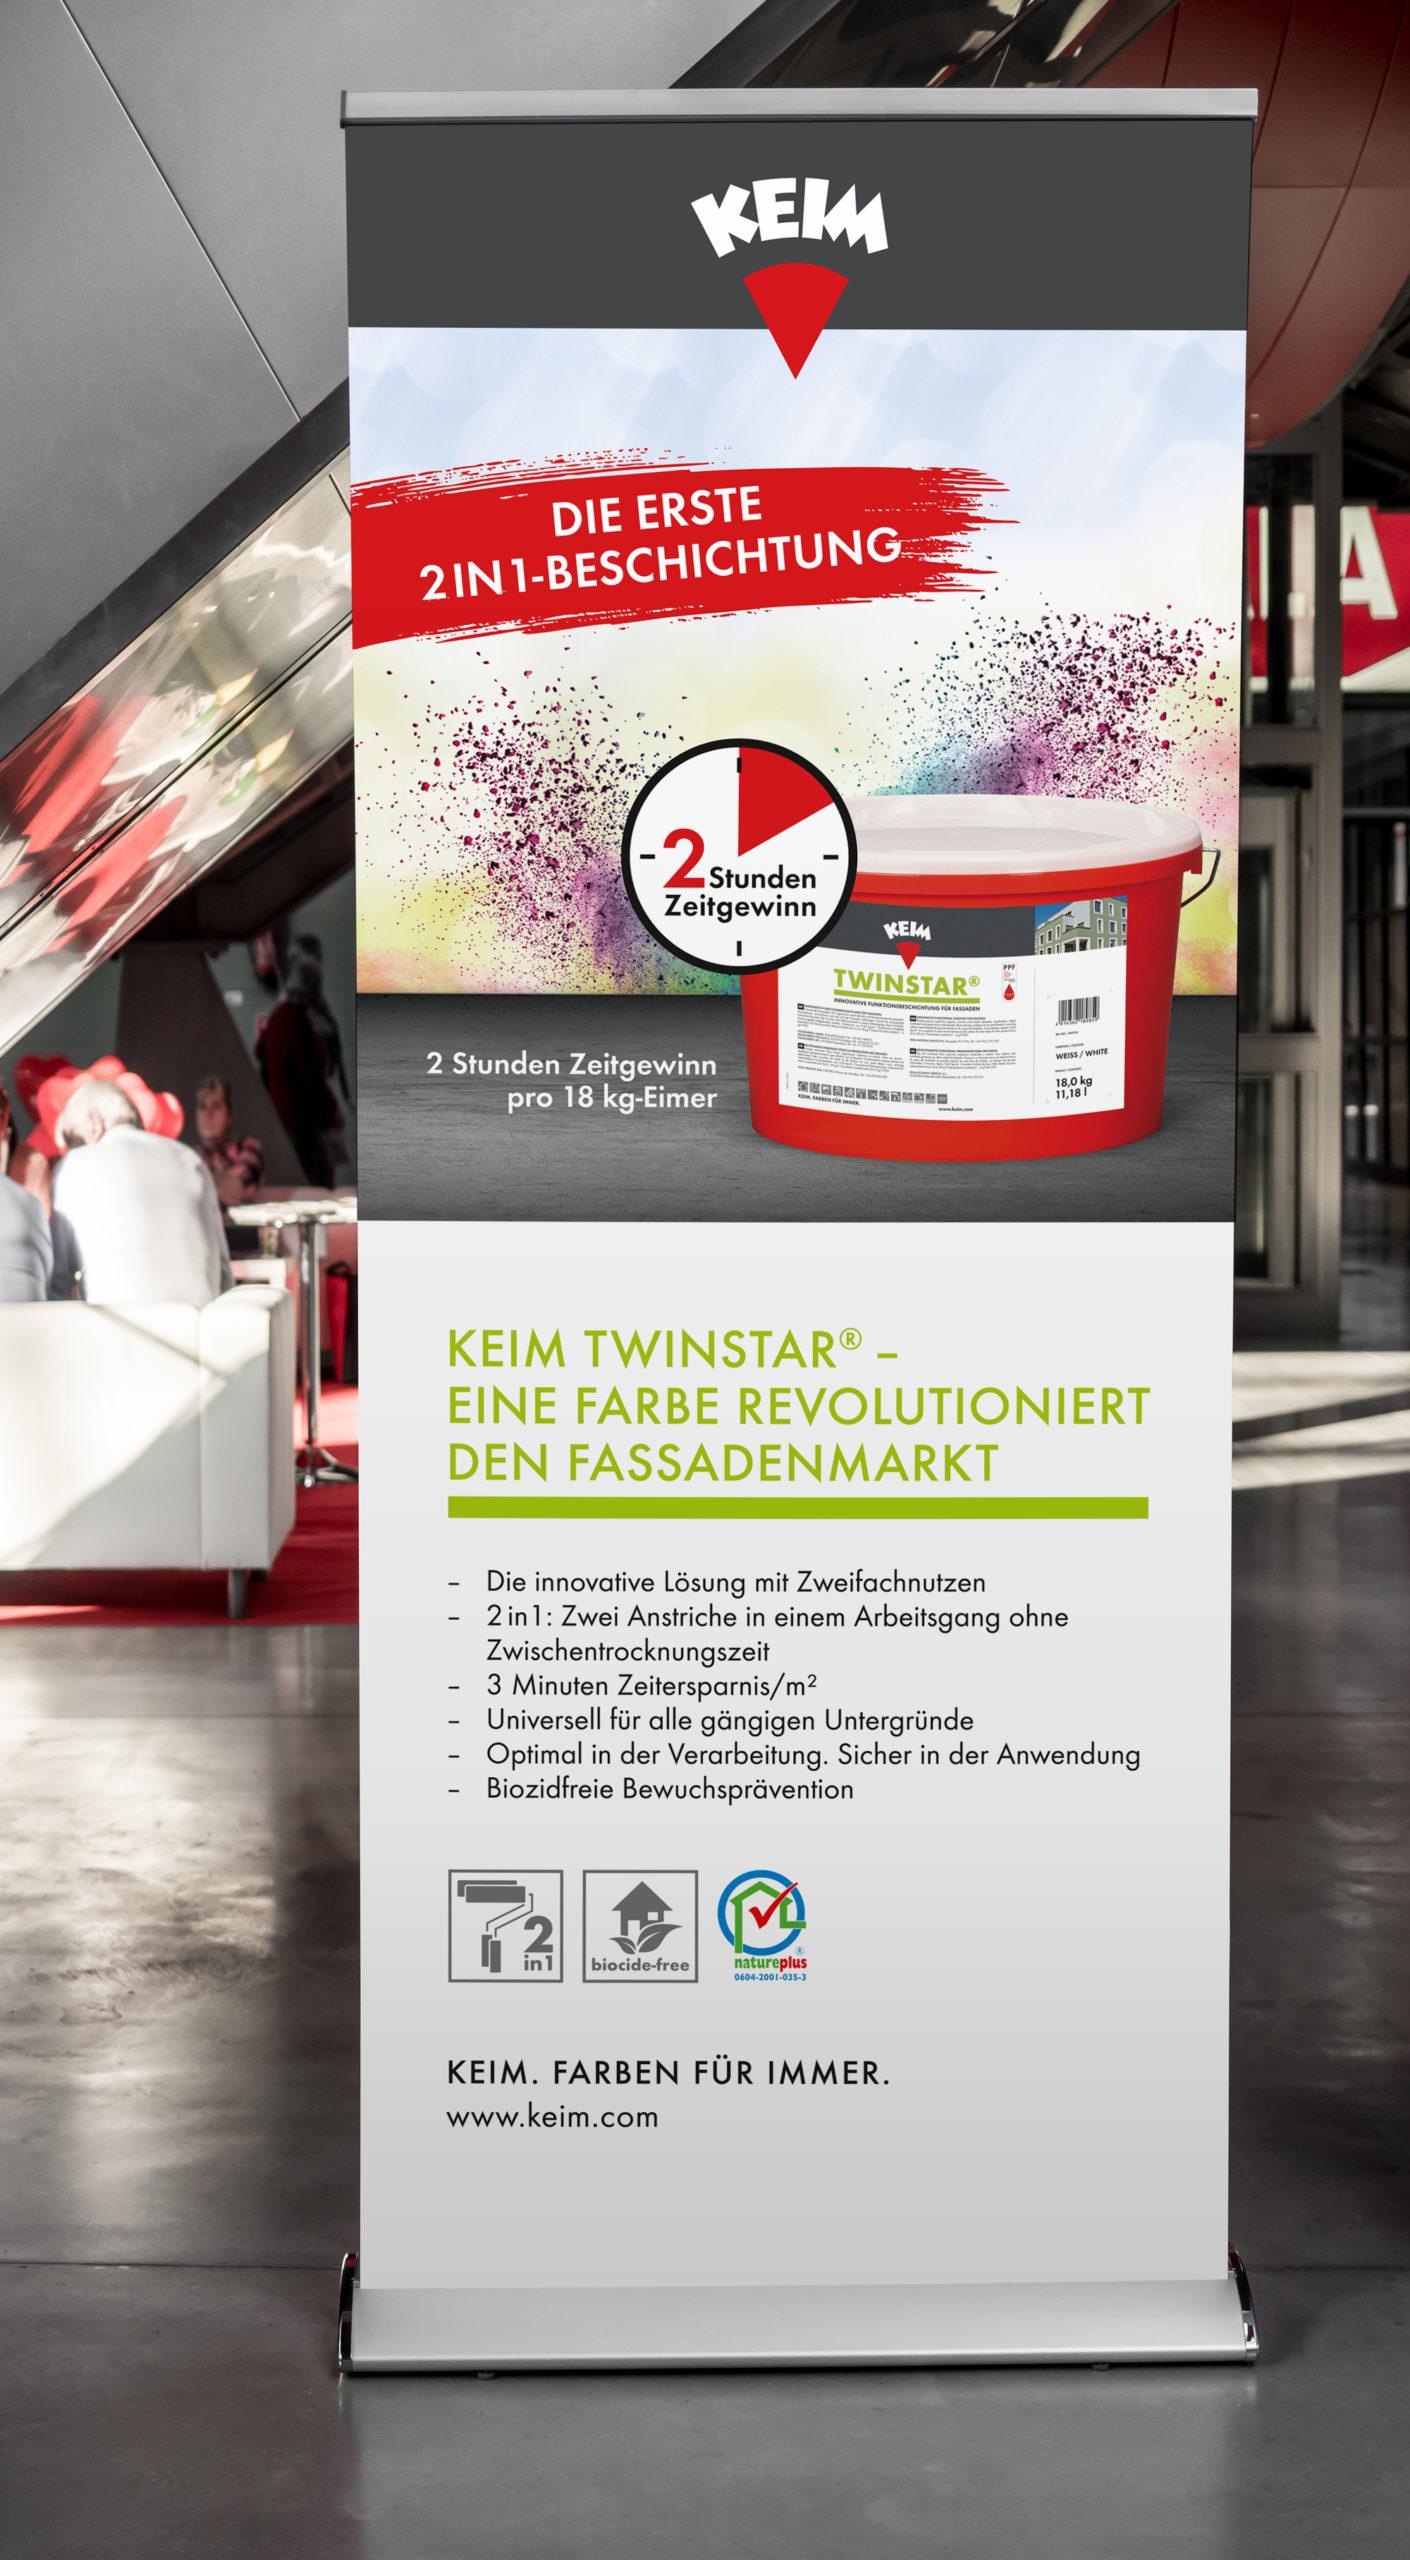 Studio dos, Grafikdesign Osnabrück, Keimfarben Twinstar Rollup